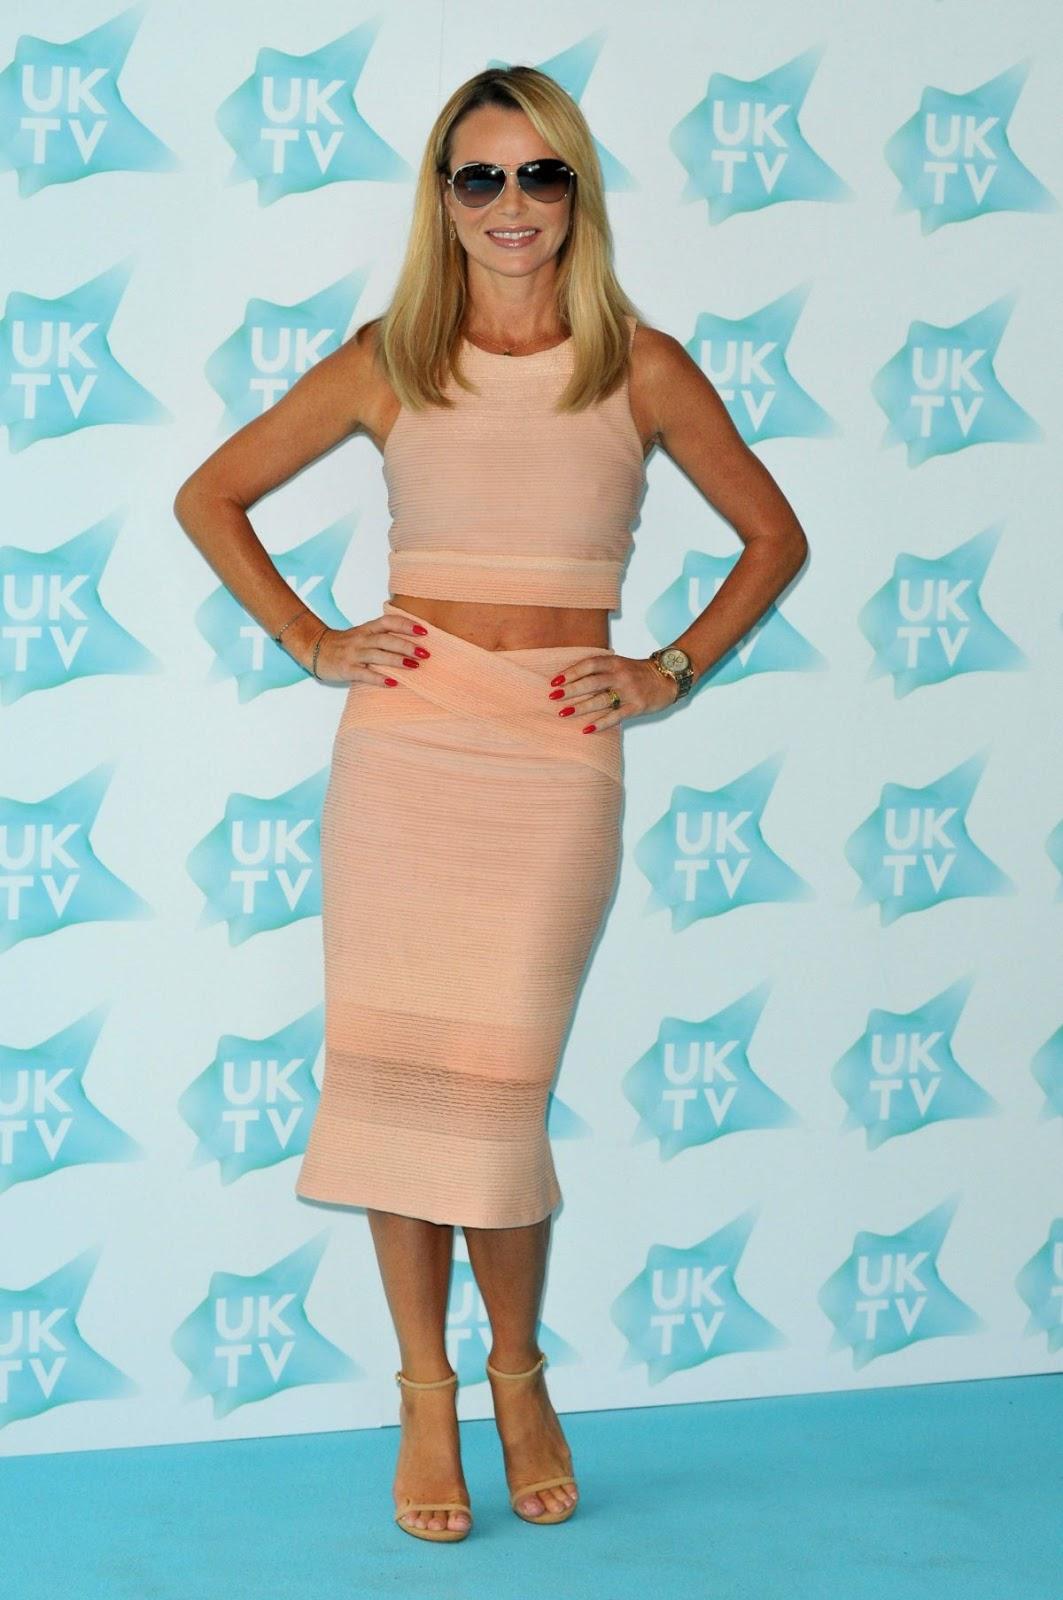 Britain's Got Talent judge Amanda Holden At UK-TV Live New Season Launch In London Hd Photos